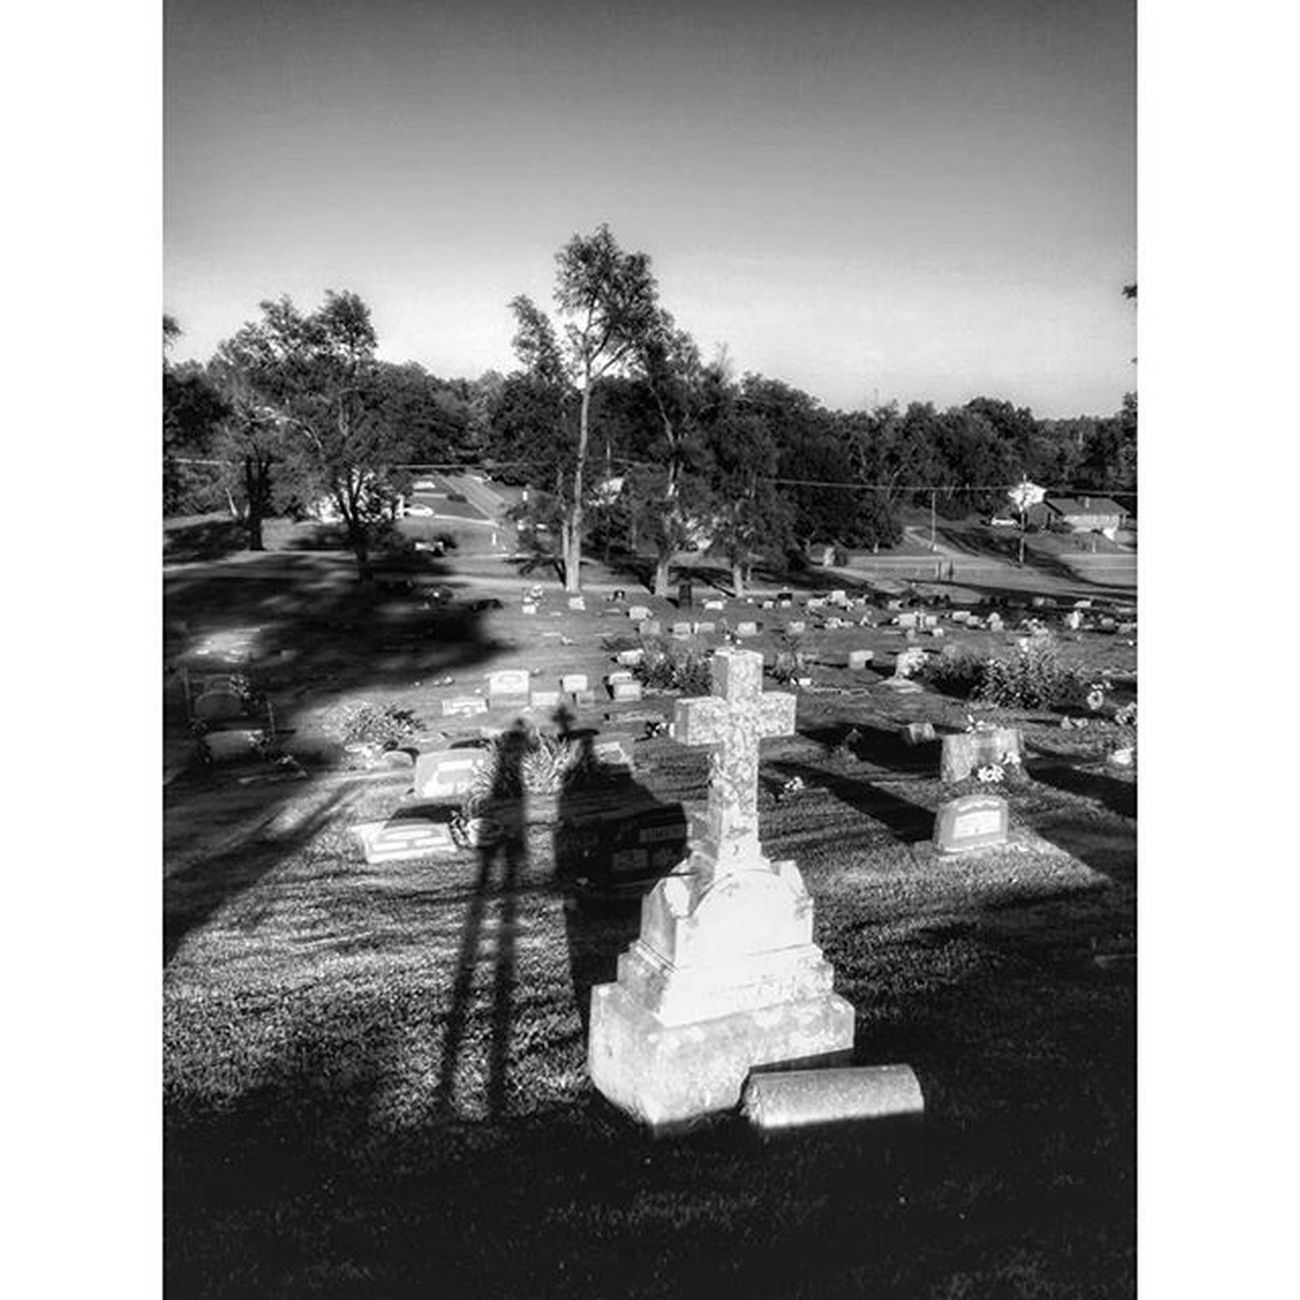 Shadow fun..... Ks_pride Ipulledoverforthis Kansasphotographer Kansasphotos Graveyard_dead World_bnw Bnw_life Bnw_sunset Bnw Bnw_captures